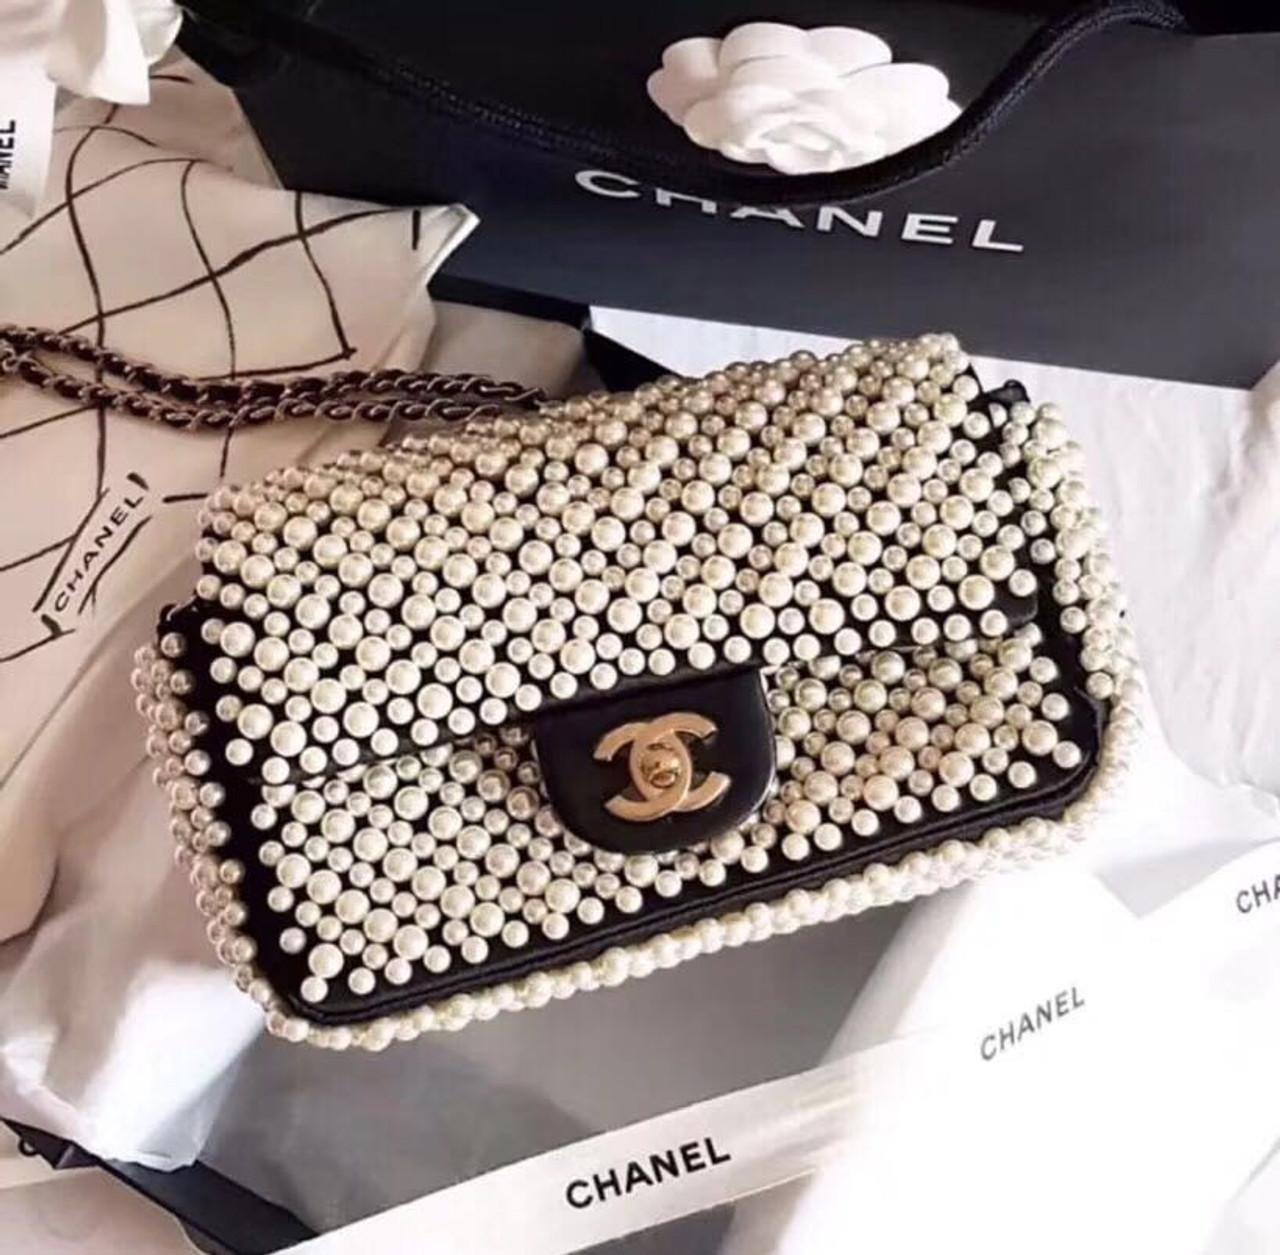 01a5a7774544 Chanel Limited Edition Pearly Flap Bag 2019 - Bella Vita Moda